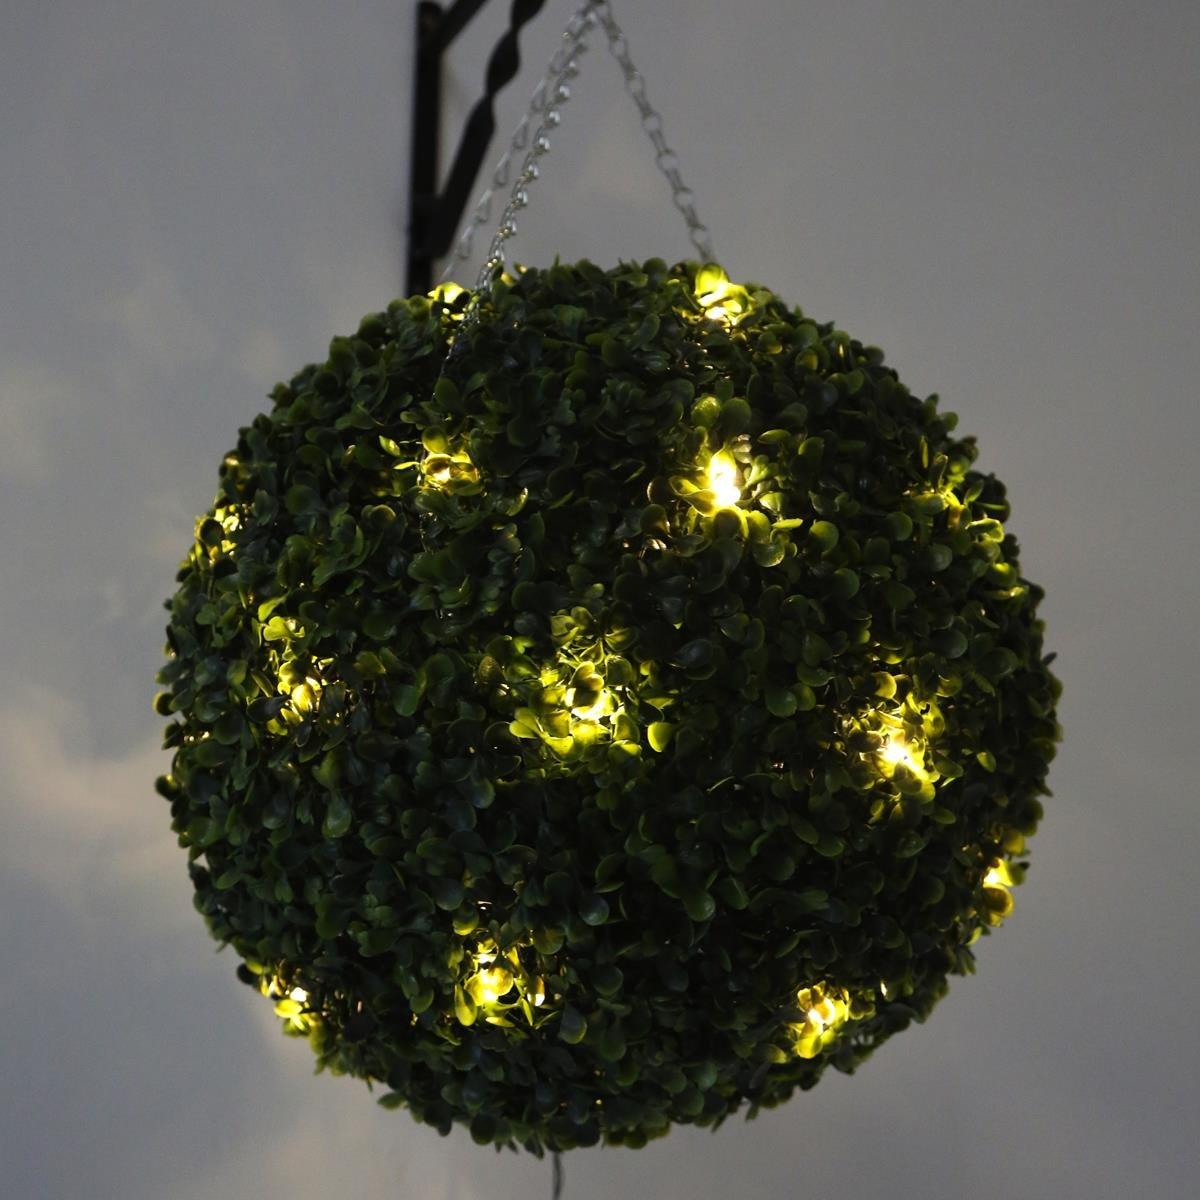 40cm Topiary Balls Part - 20: Pre Lit Topiary Ball 40cm (30 Warm White LED Lights): Amazon.co.uk: Lighting